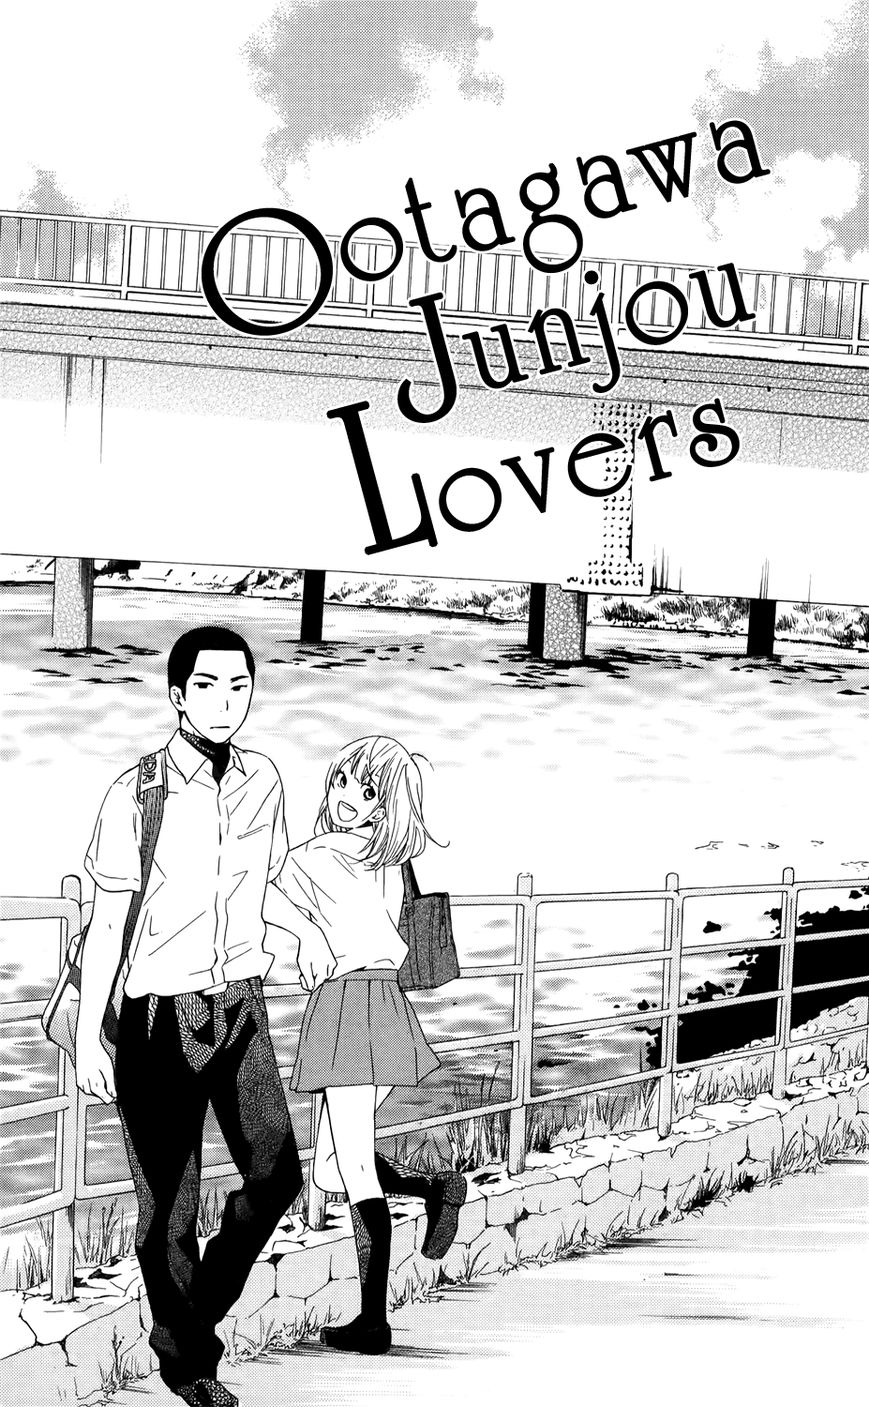 Ootagawa Junjou Lovers 3 Page 2